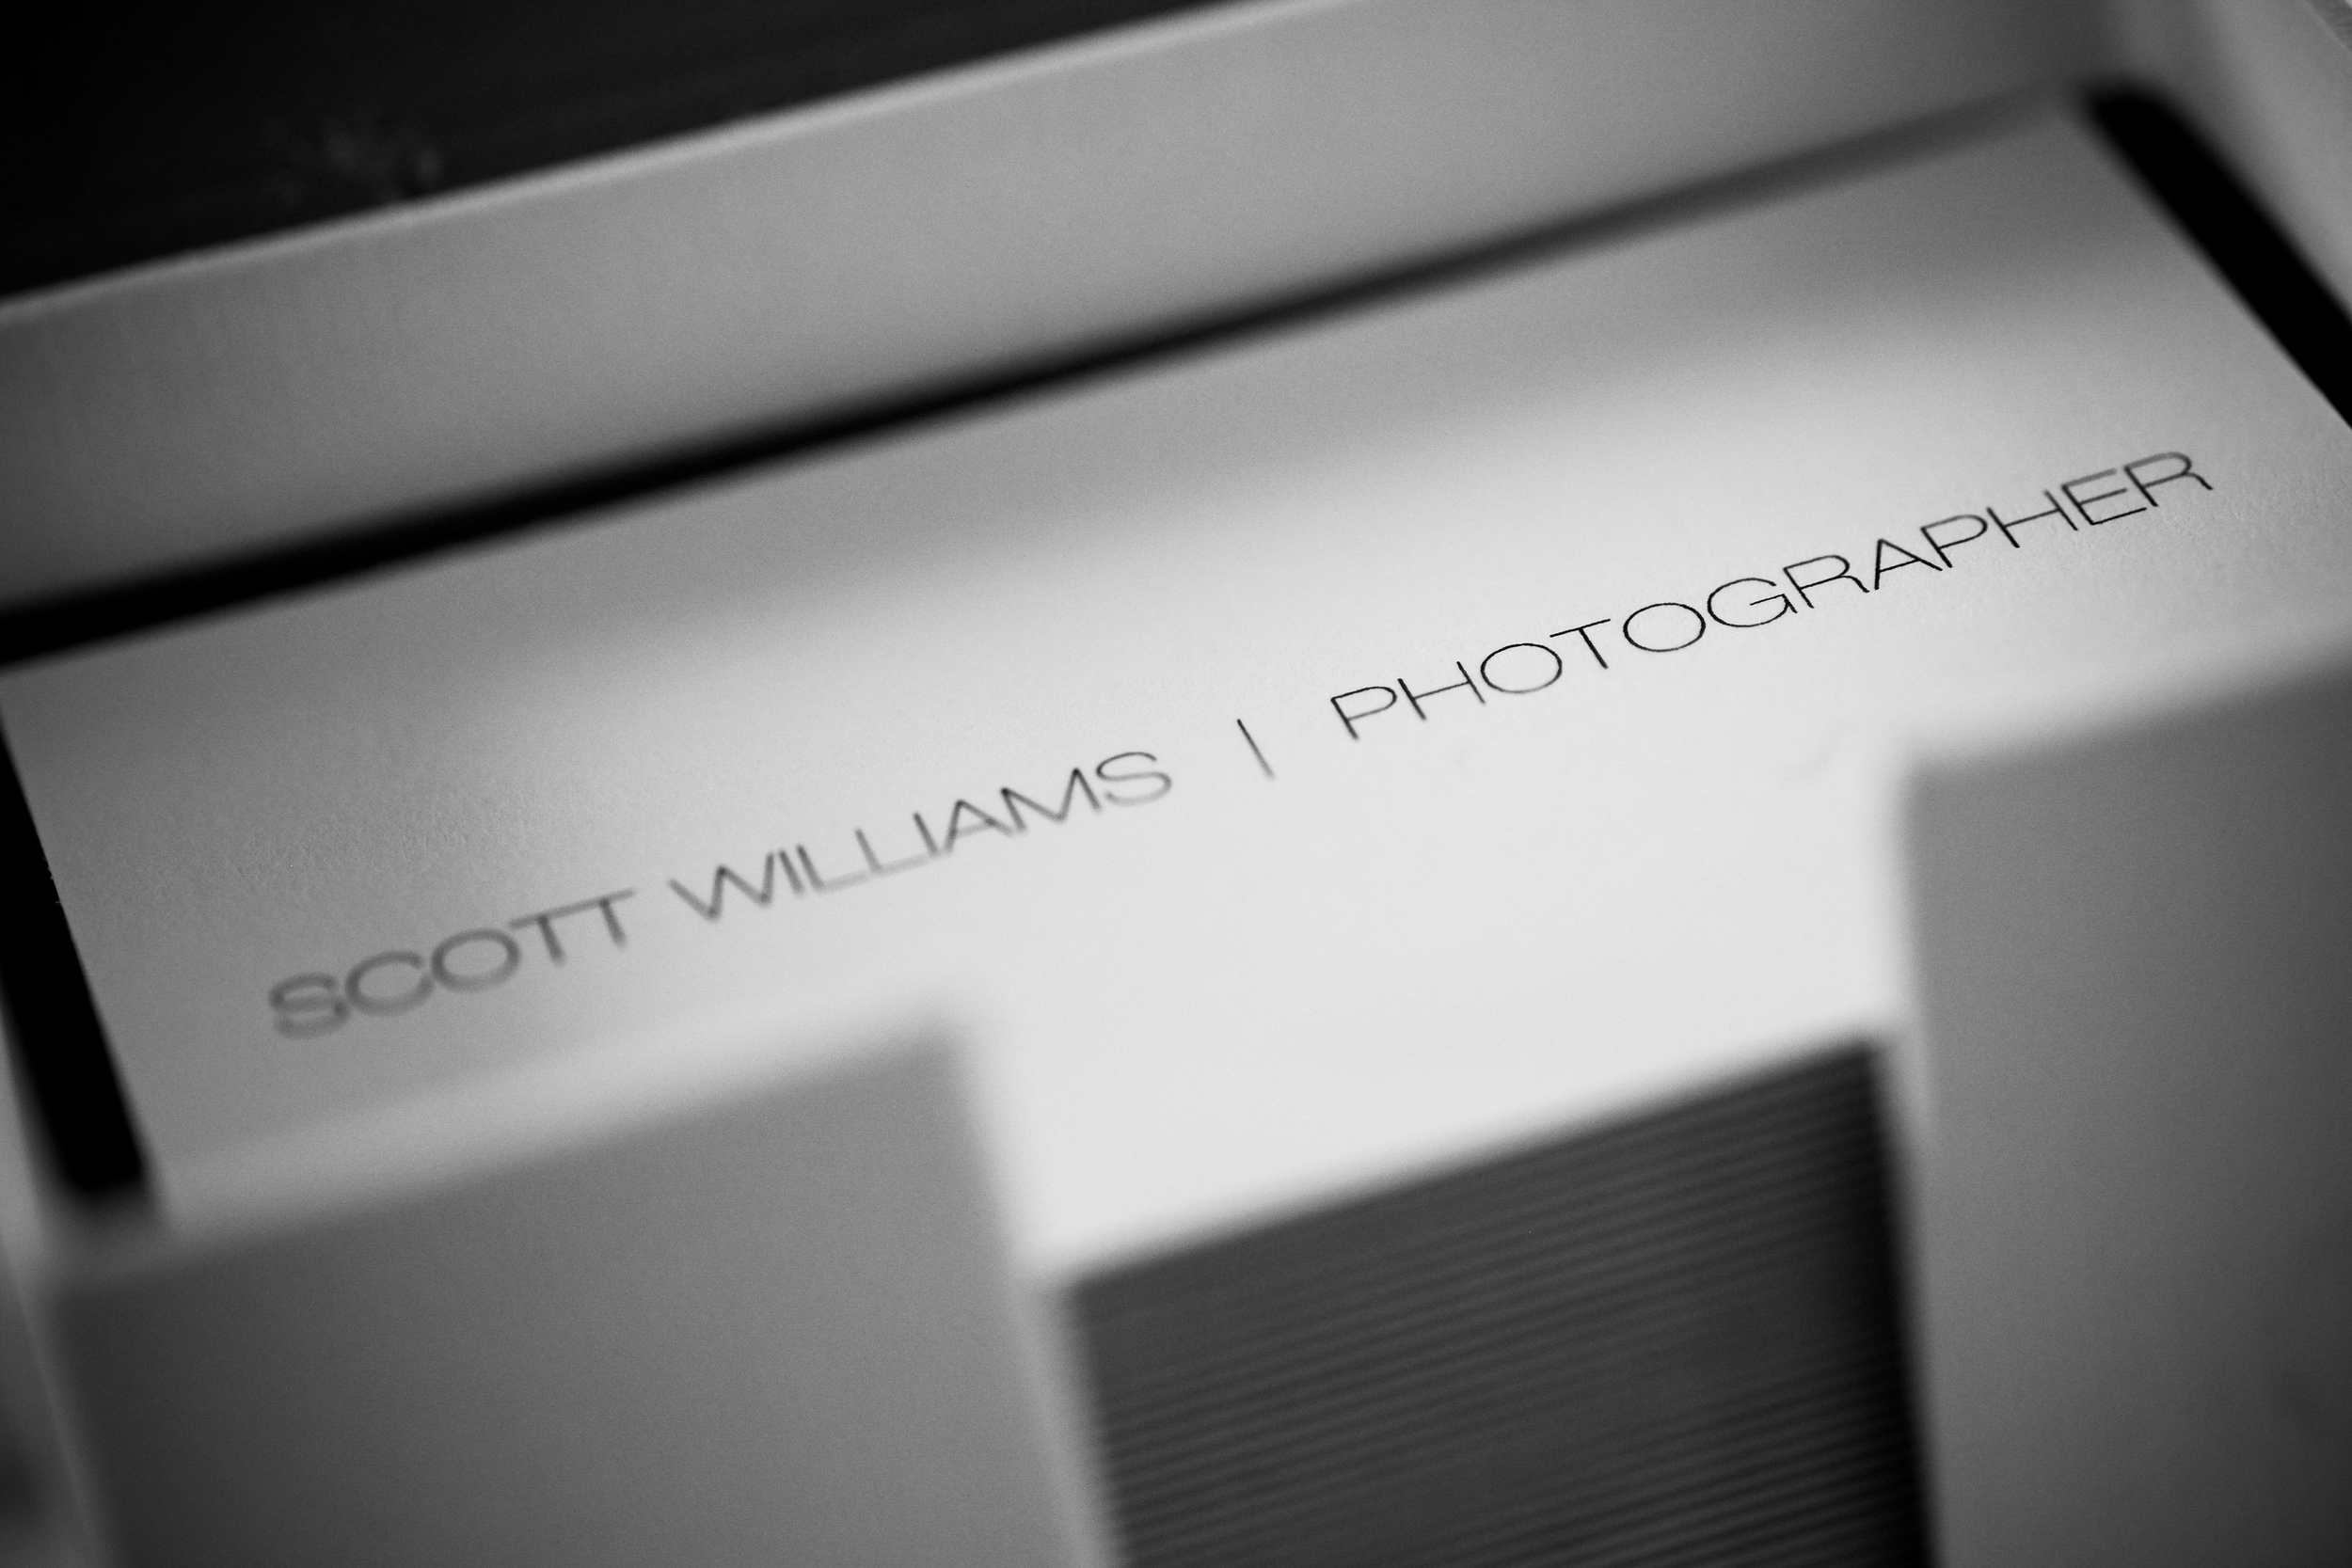 scott-williams-photographer-business-cards-002.jpg